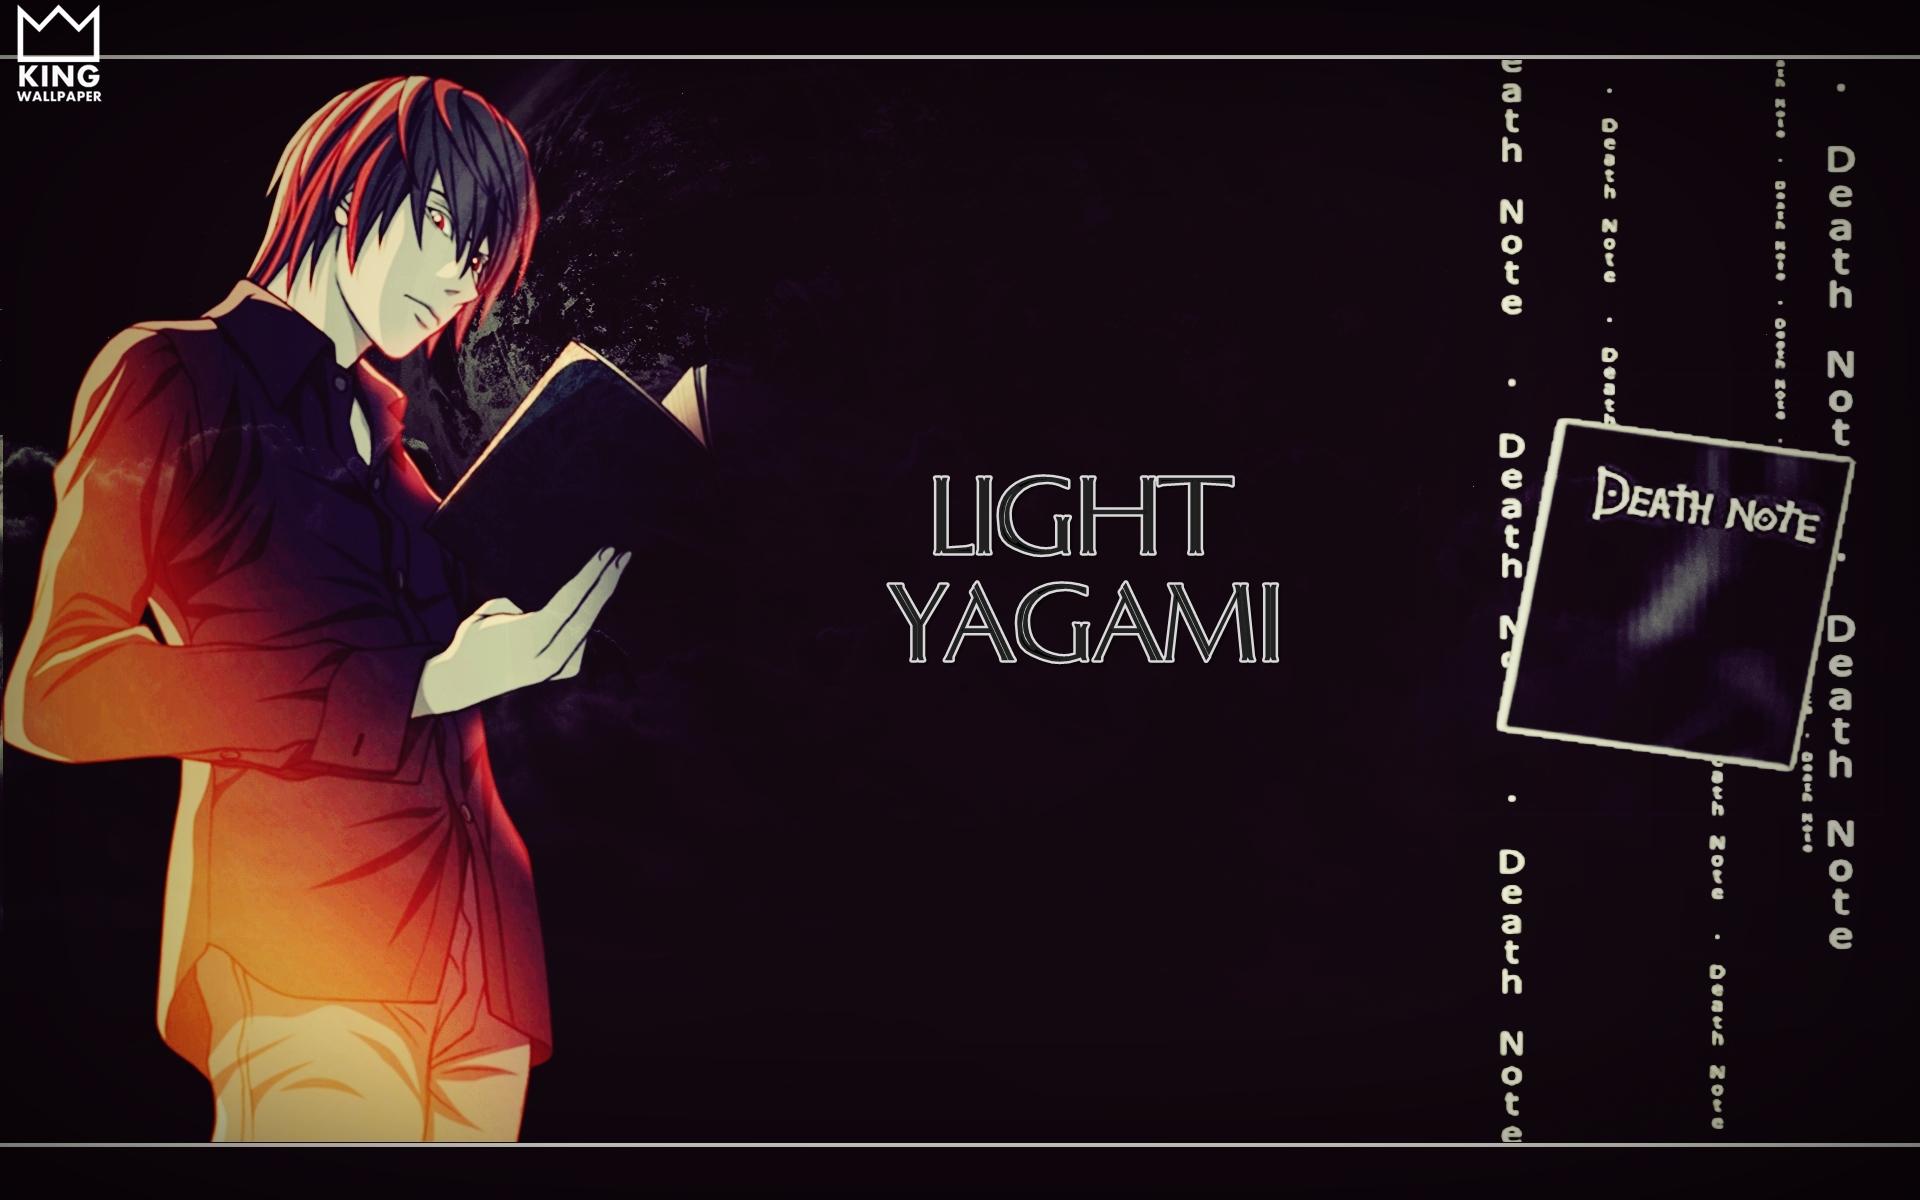 Light Yagami Wallpaper   Death Note by Kingwallpaper 1920x1200